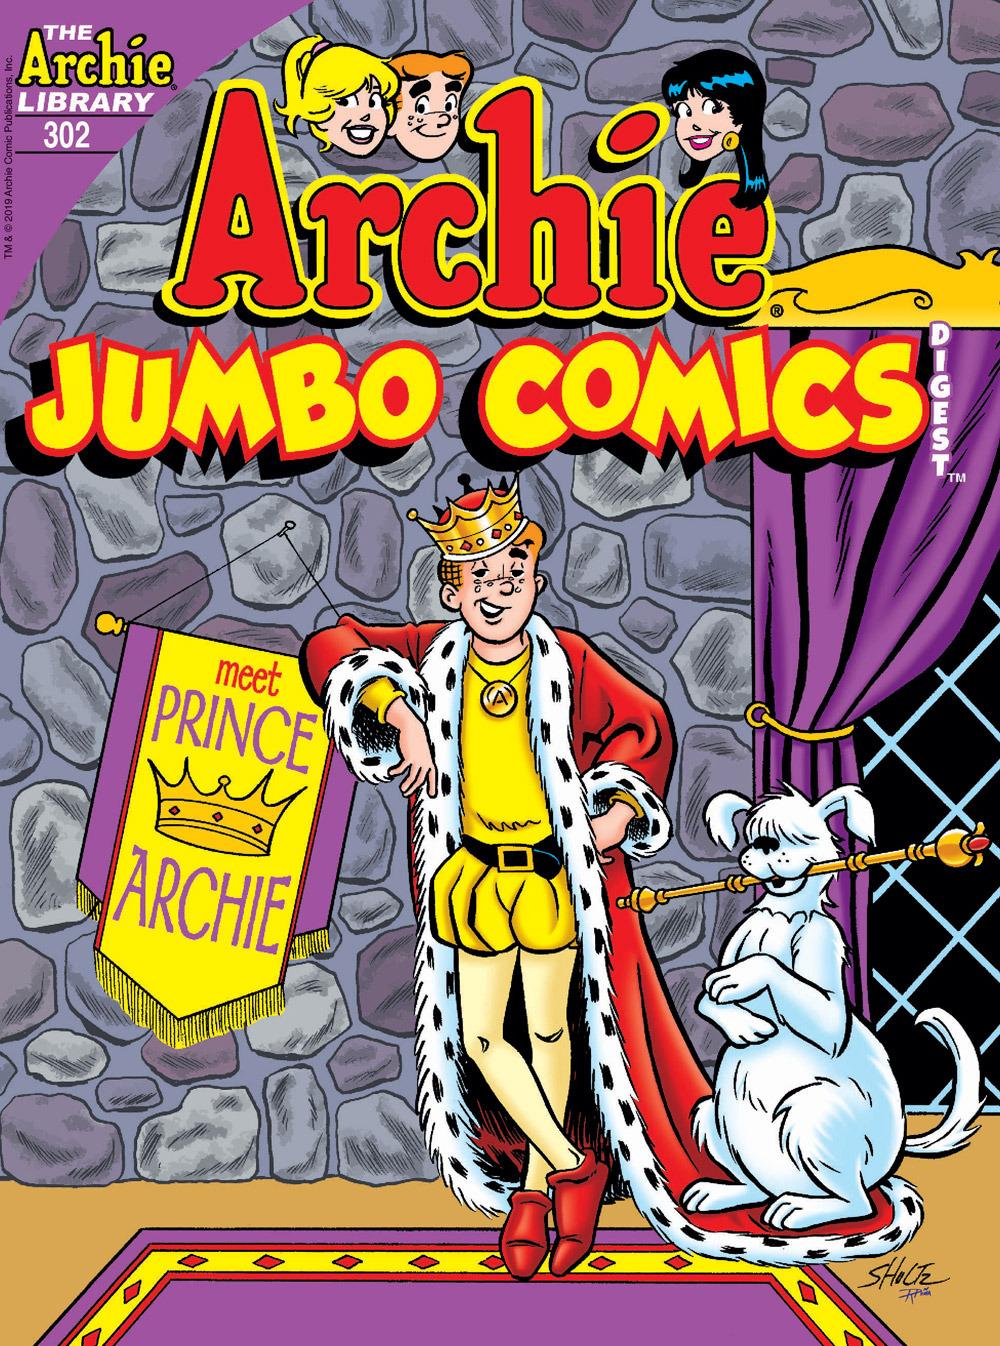 Archie Comics Send Prince Archie to London...